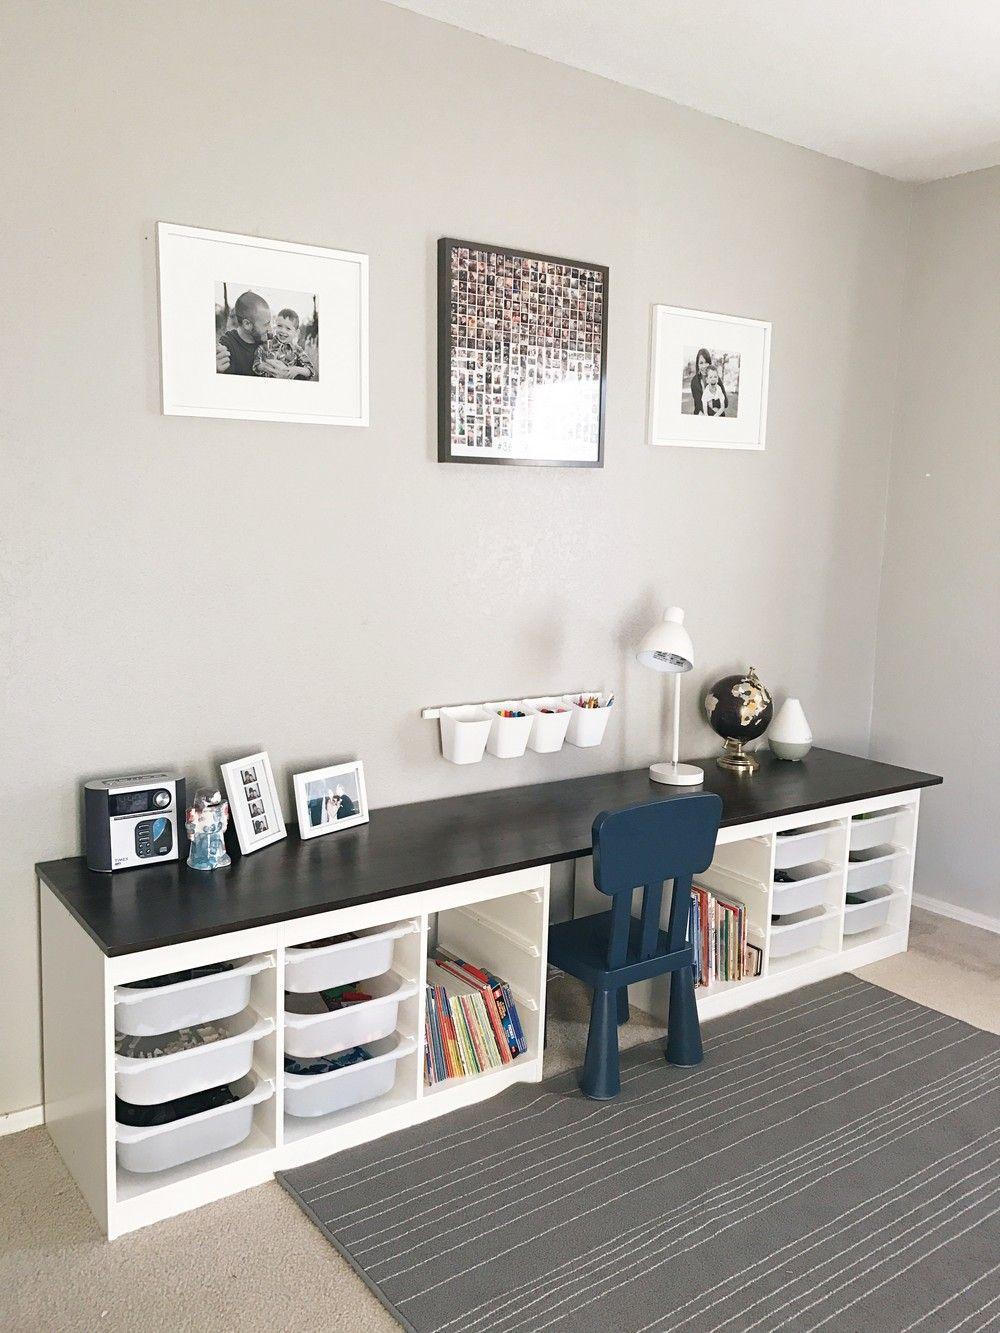 82 incredible ikea hacks for home decoration ideas for Spielzimmer einrichten ikea